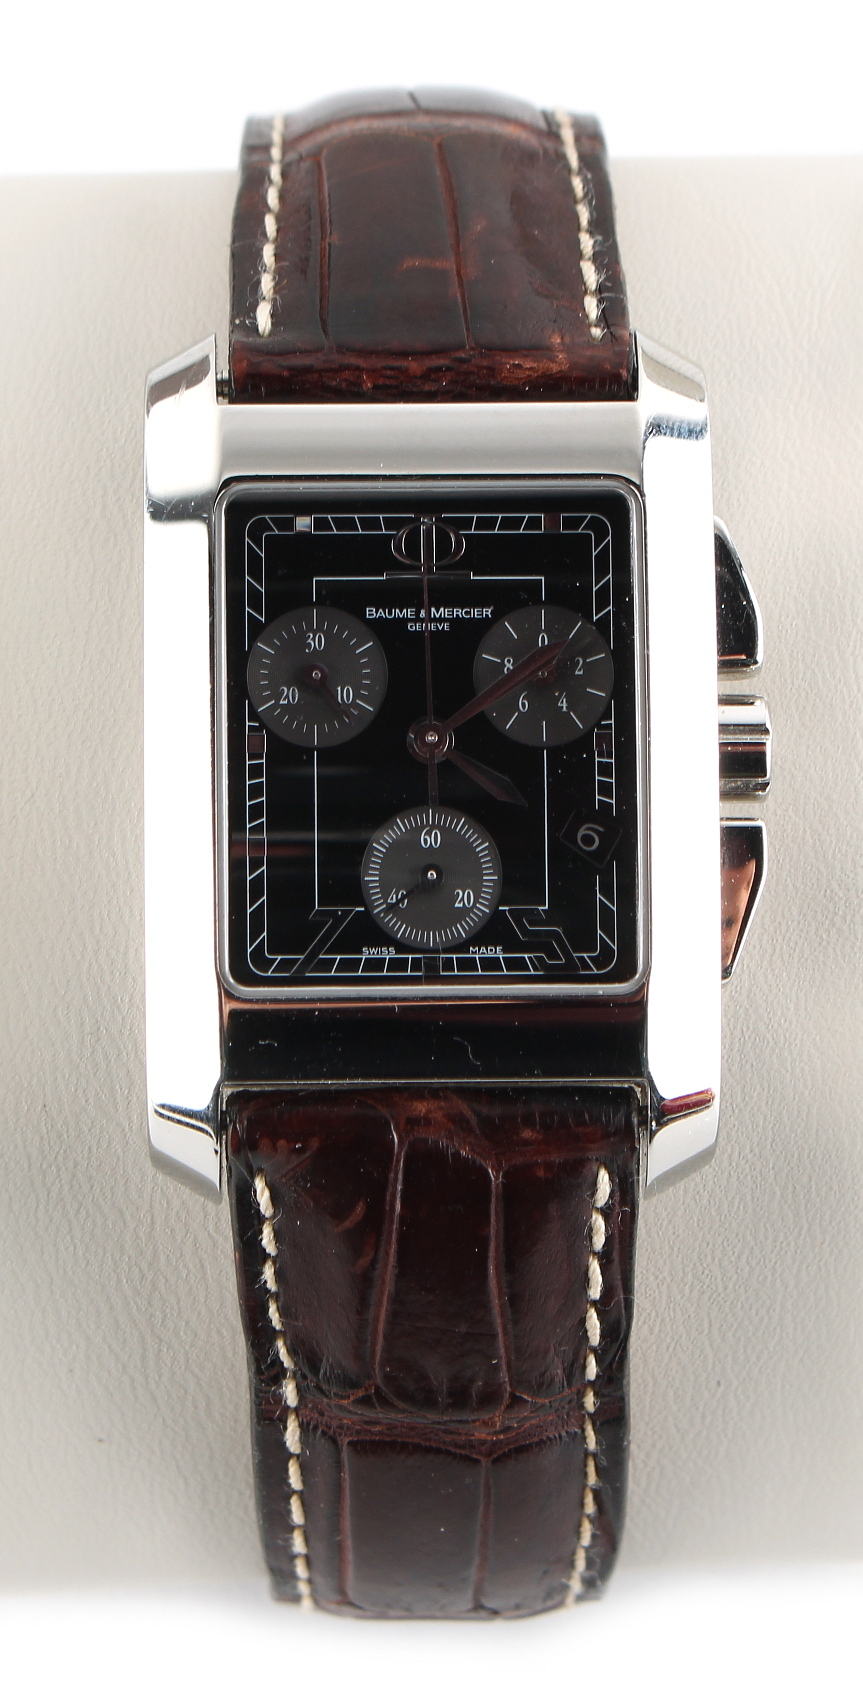 Lot 3 - Property of a gentleman - a gentleman's Baume & Mercier Hampton chronograph wristwatch, in